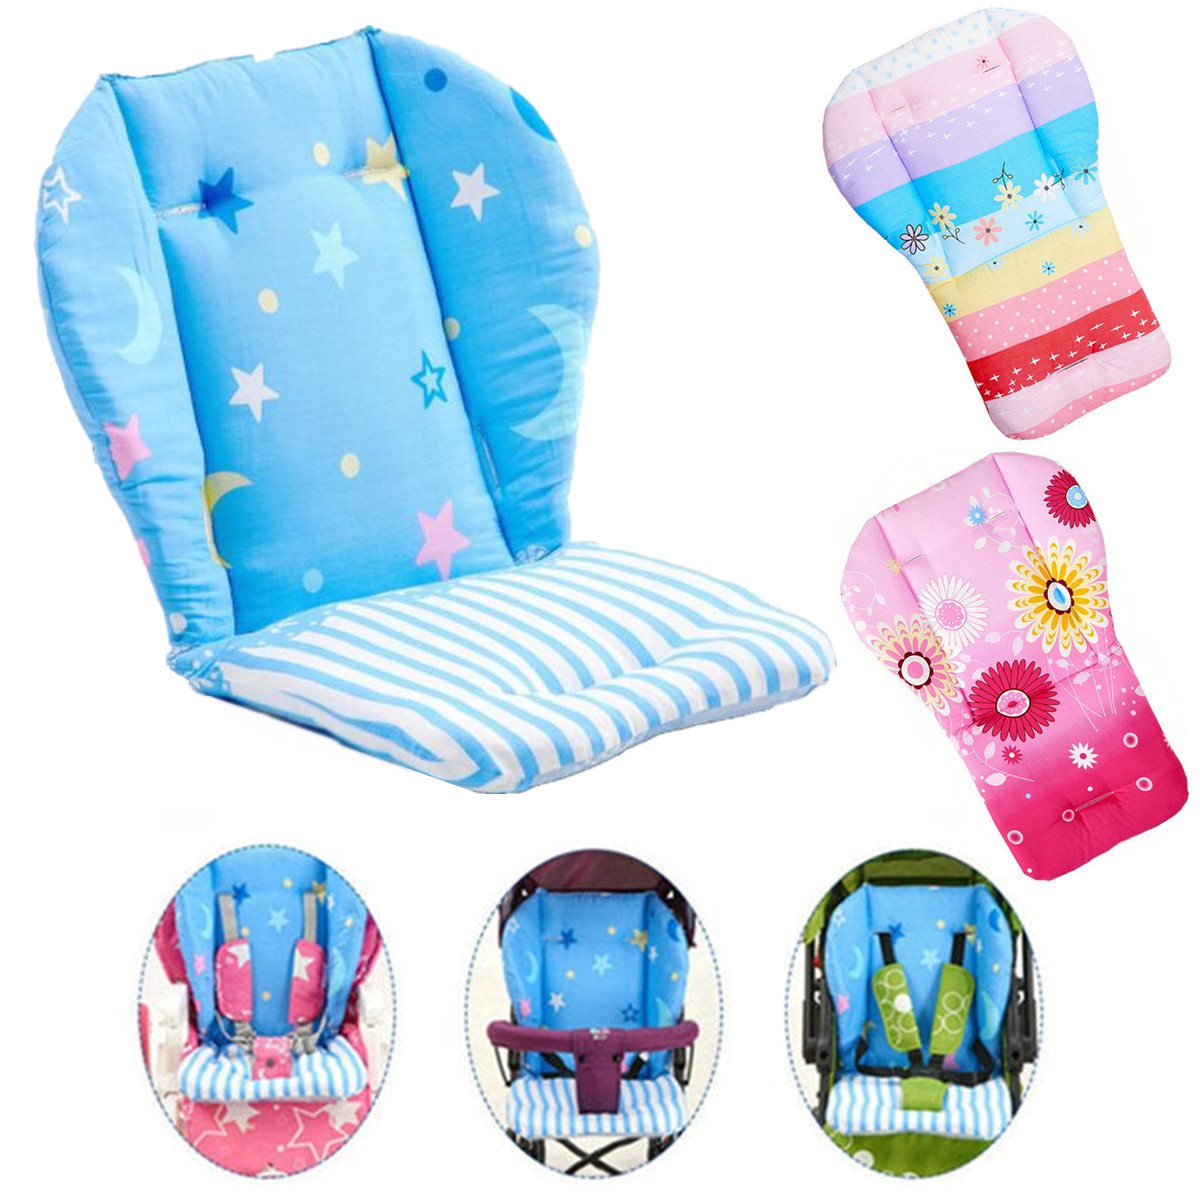 Pure Cotton Baby Stroller Seat Soft Cushion Kids Pushchair Car Cart High Chair Seat Trolley Soft Baby Stroller Cushion Pad Acces